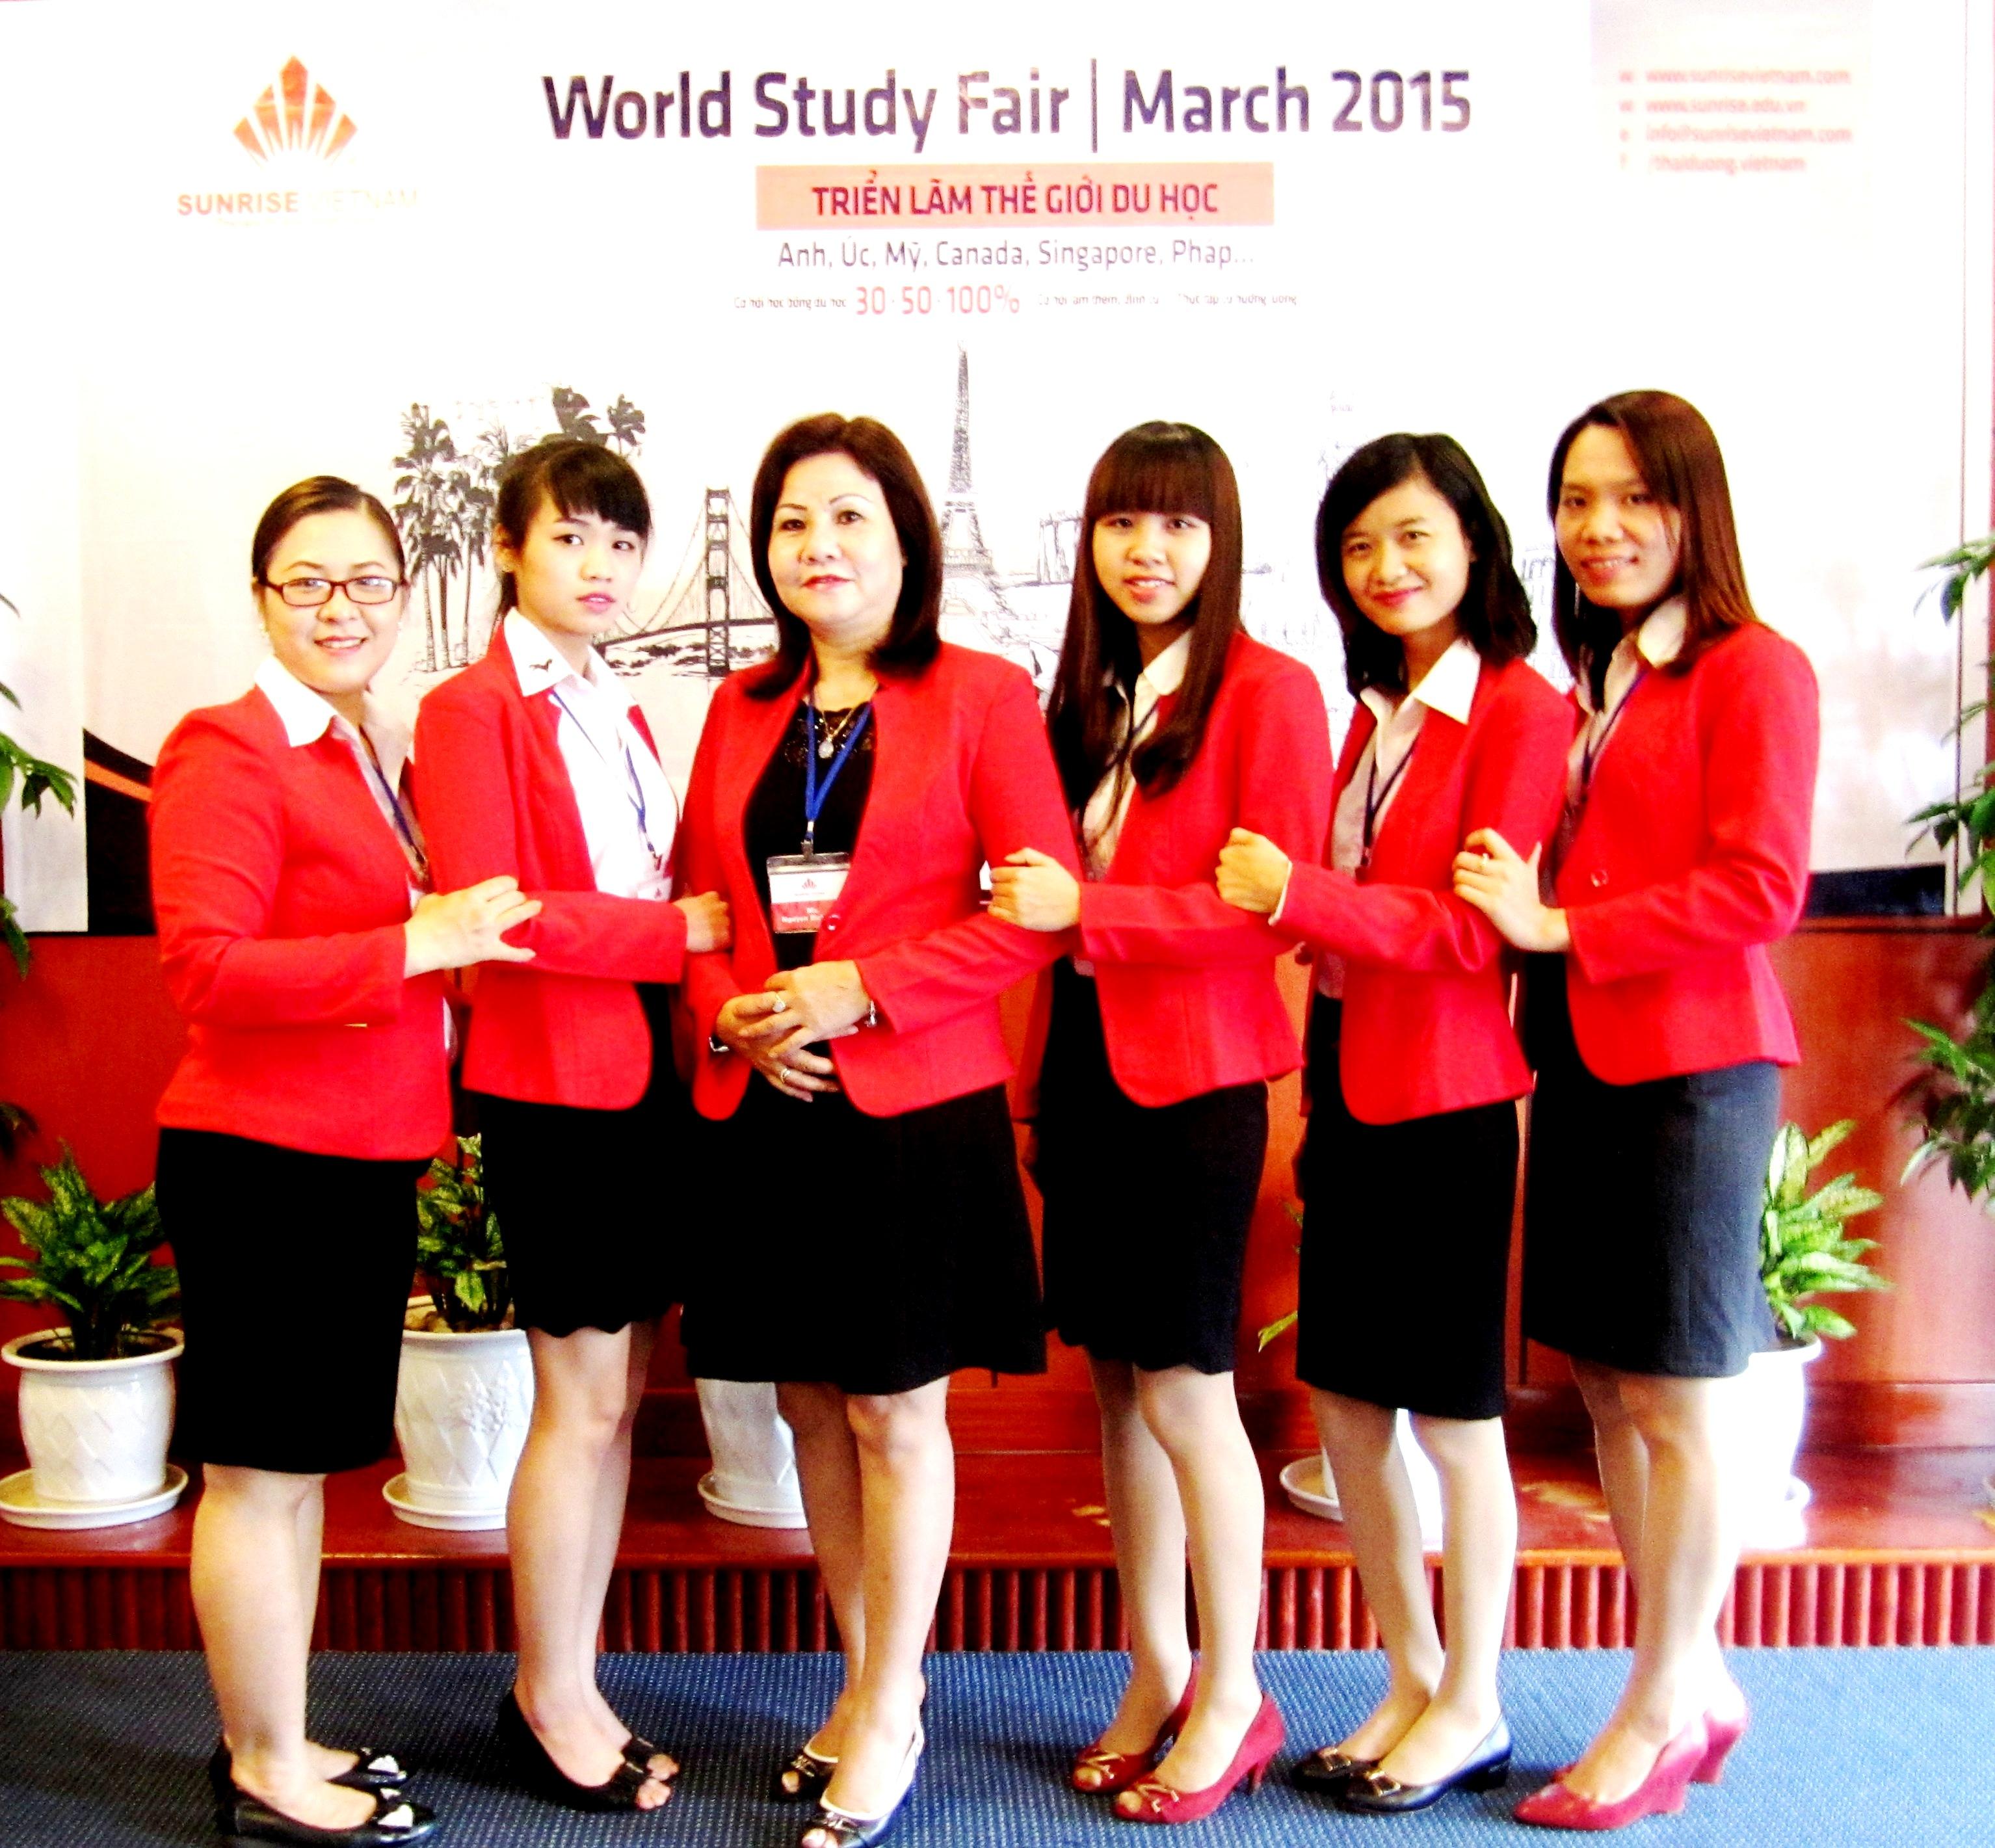 Sunrise Vietnam's female staff